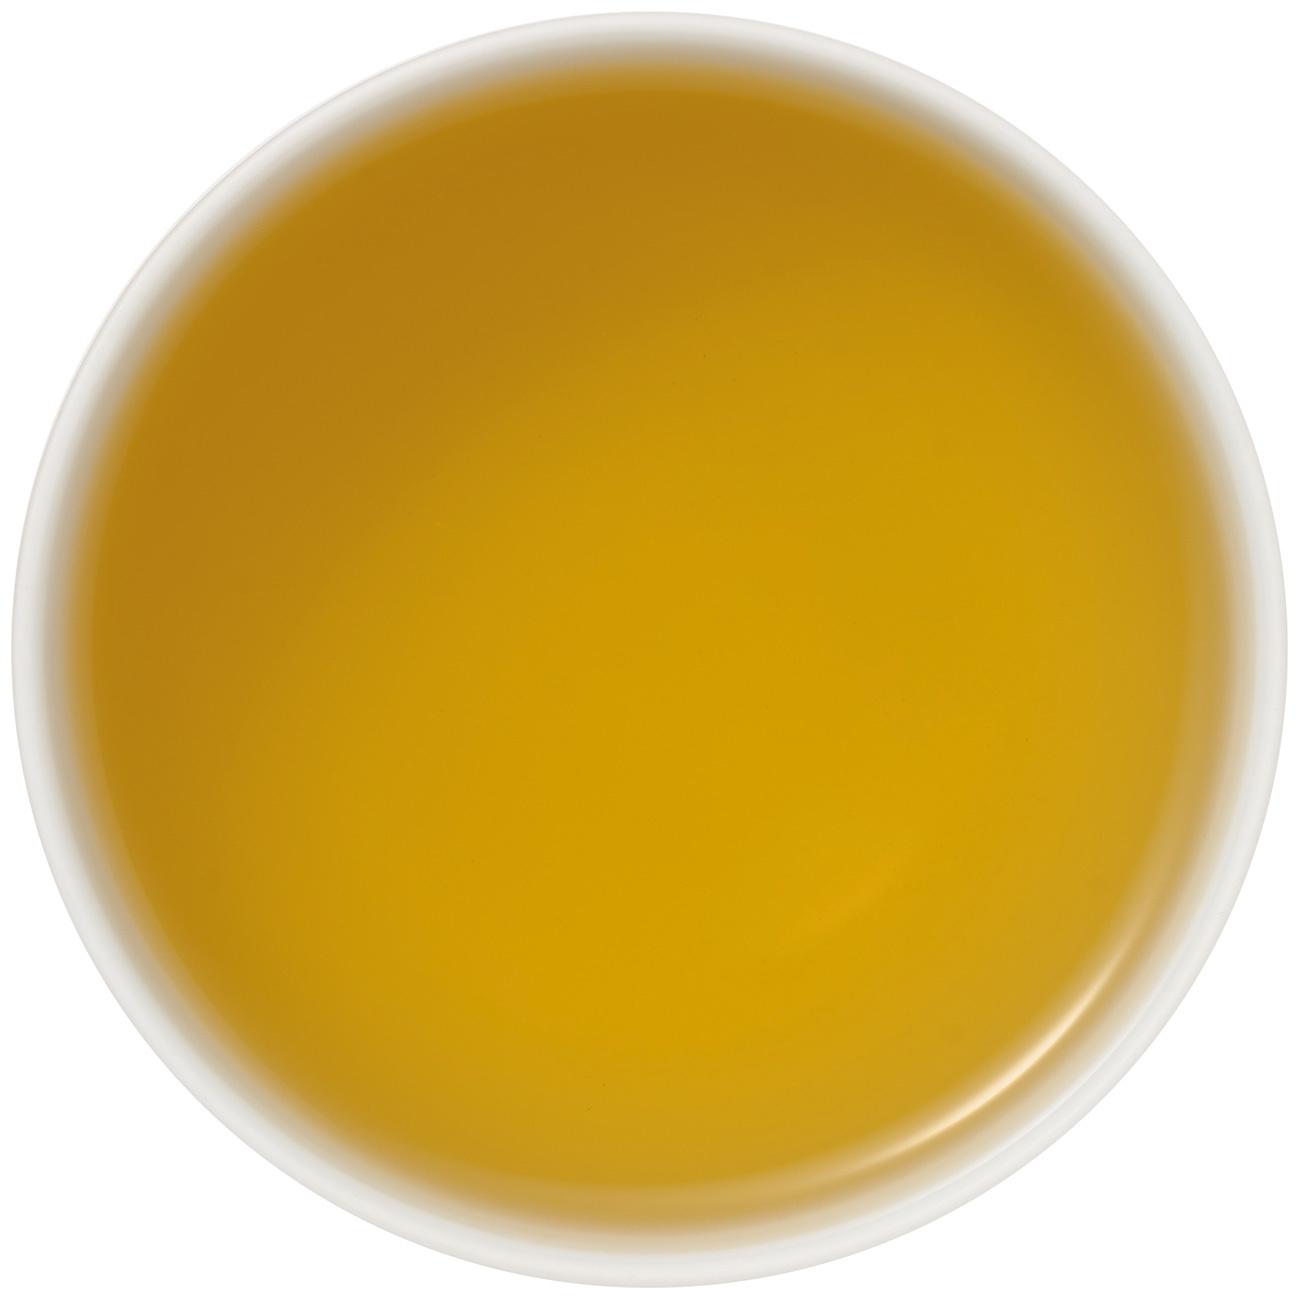 Mangoline thee